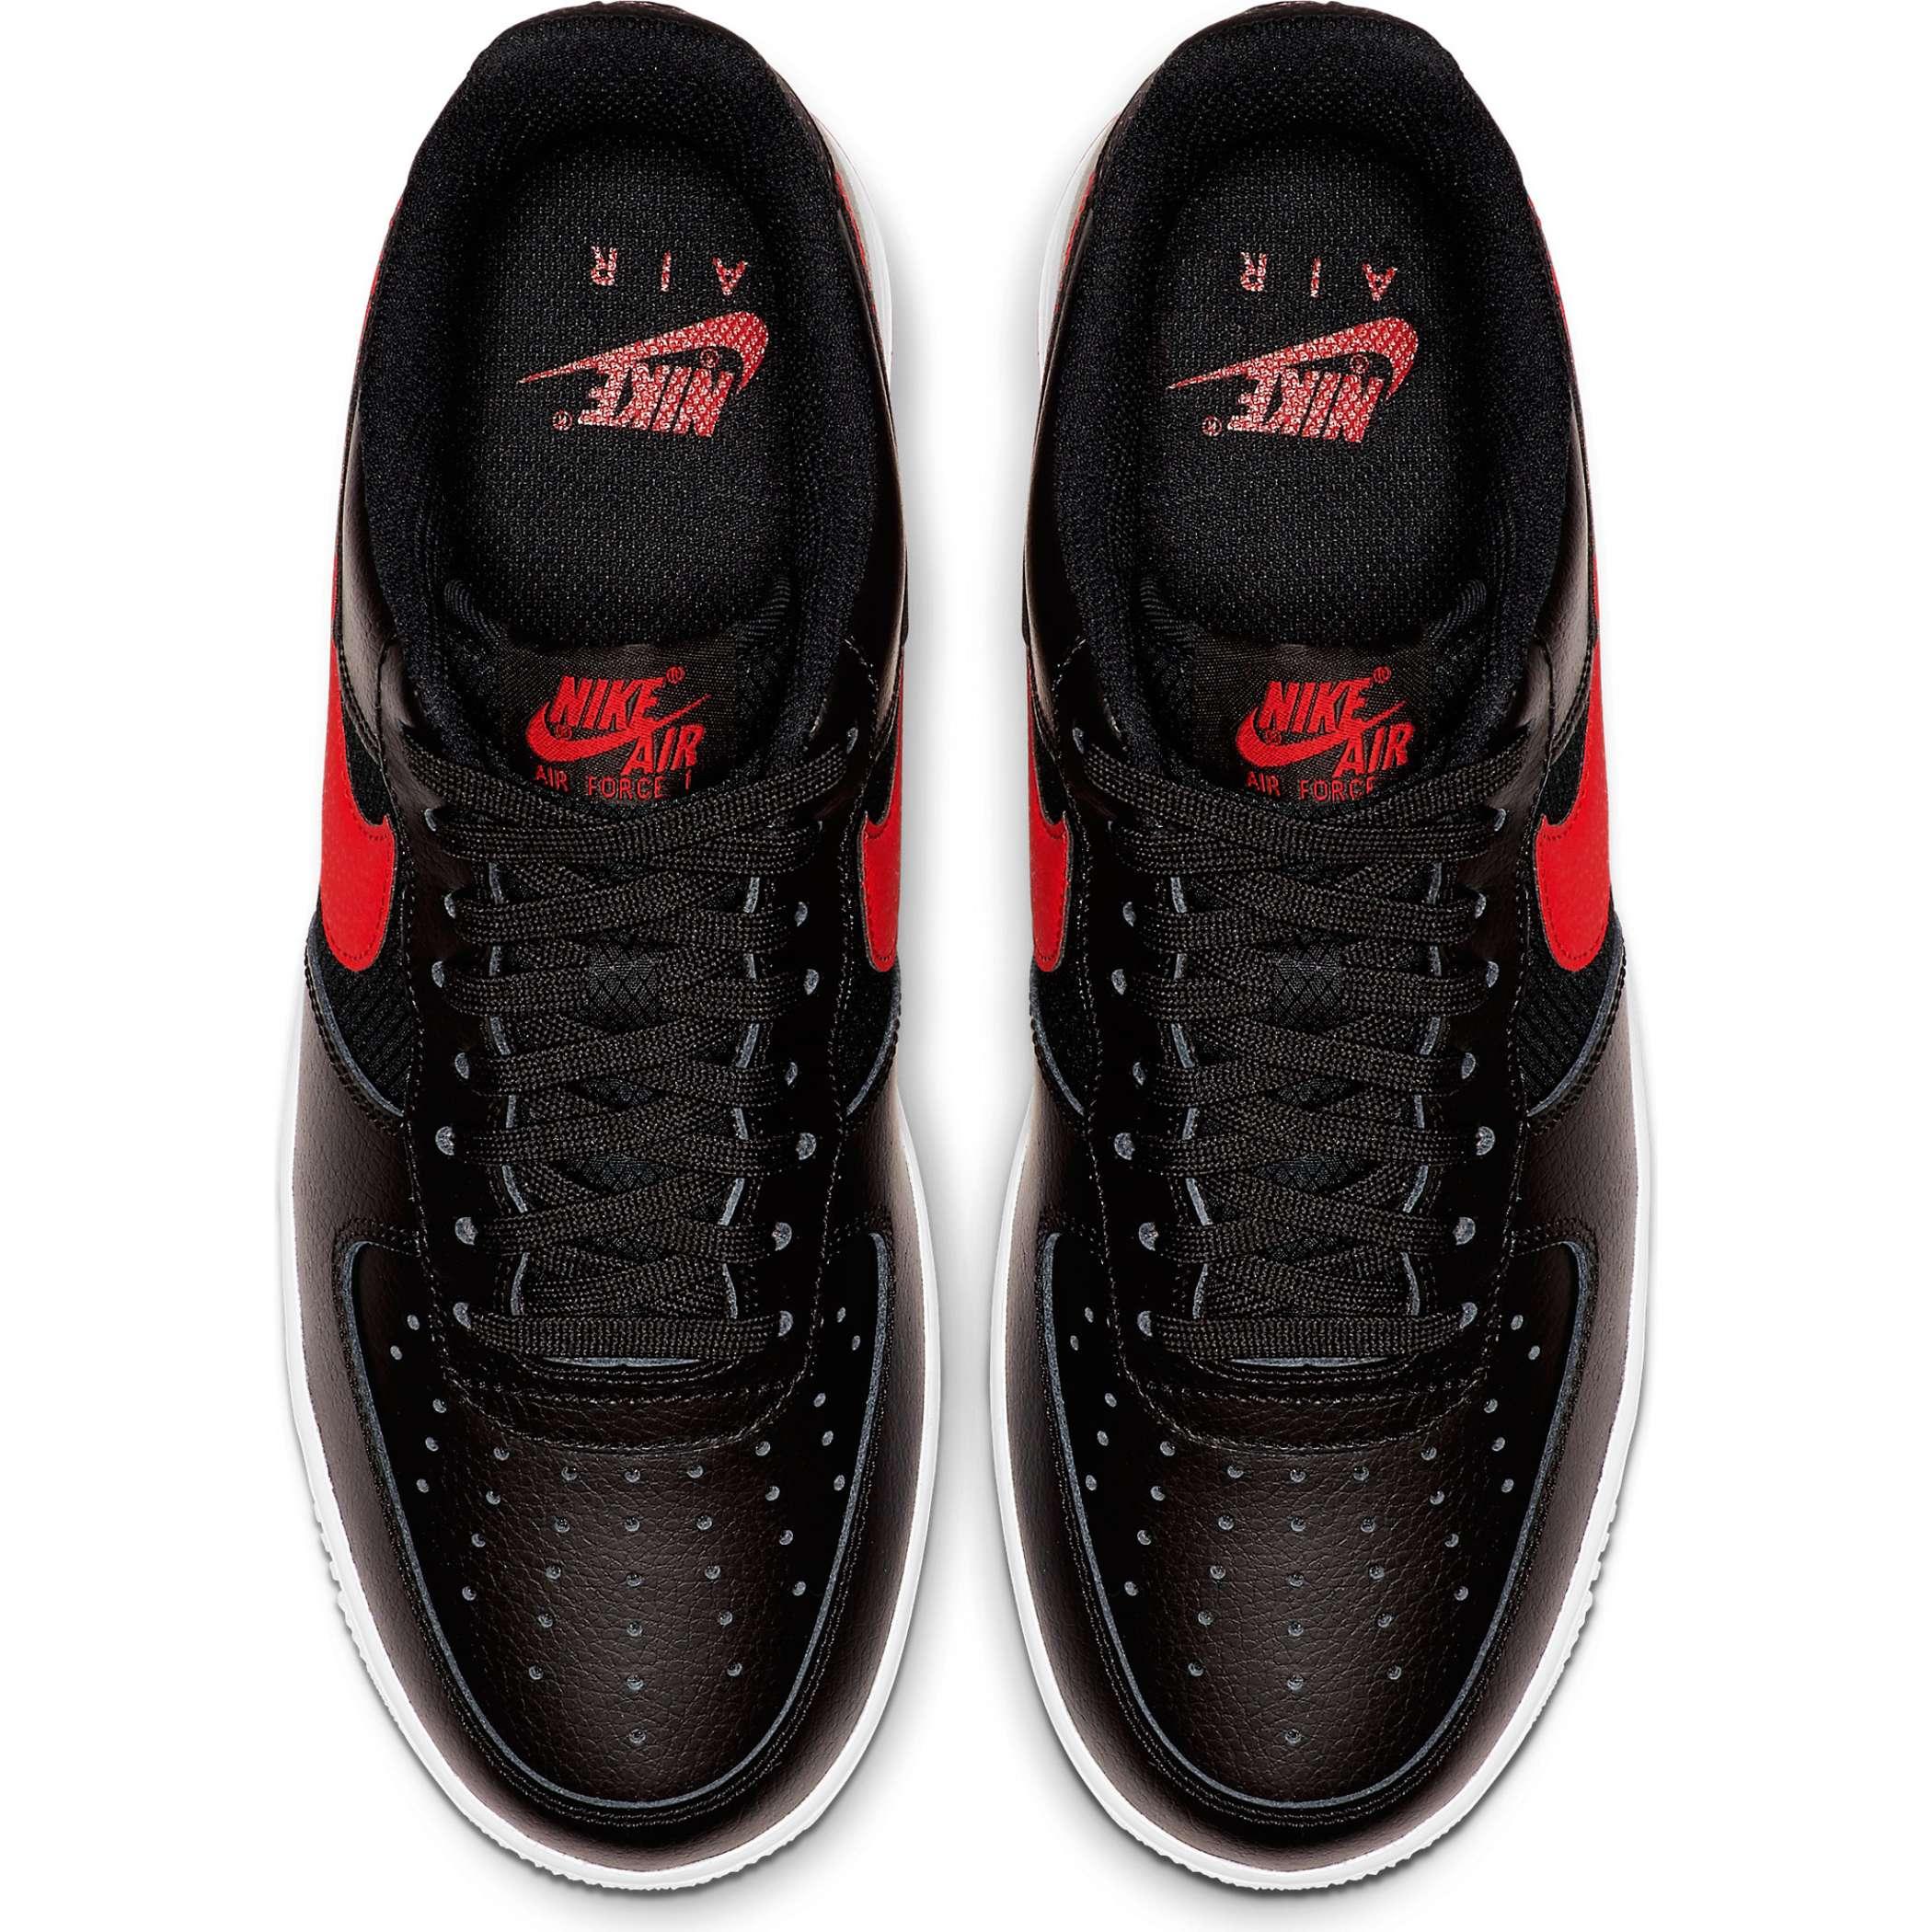 1b8876d0 Мужские кроссовки Nike Air Force 1 '07 LV8 Black/University Red-White -